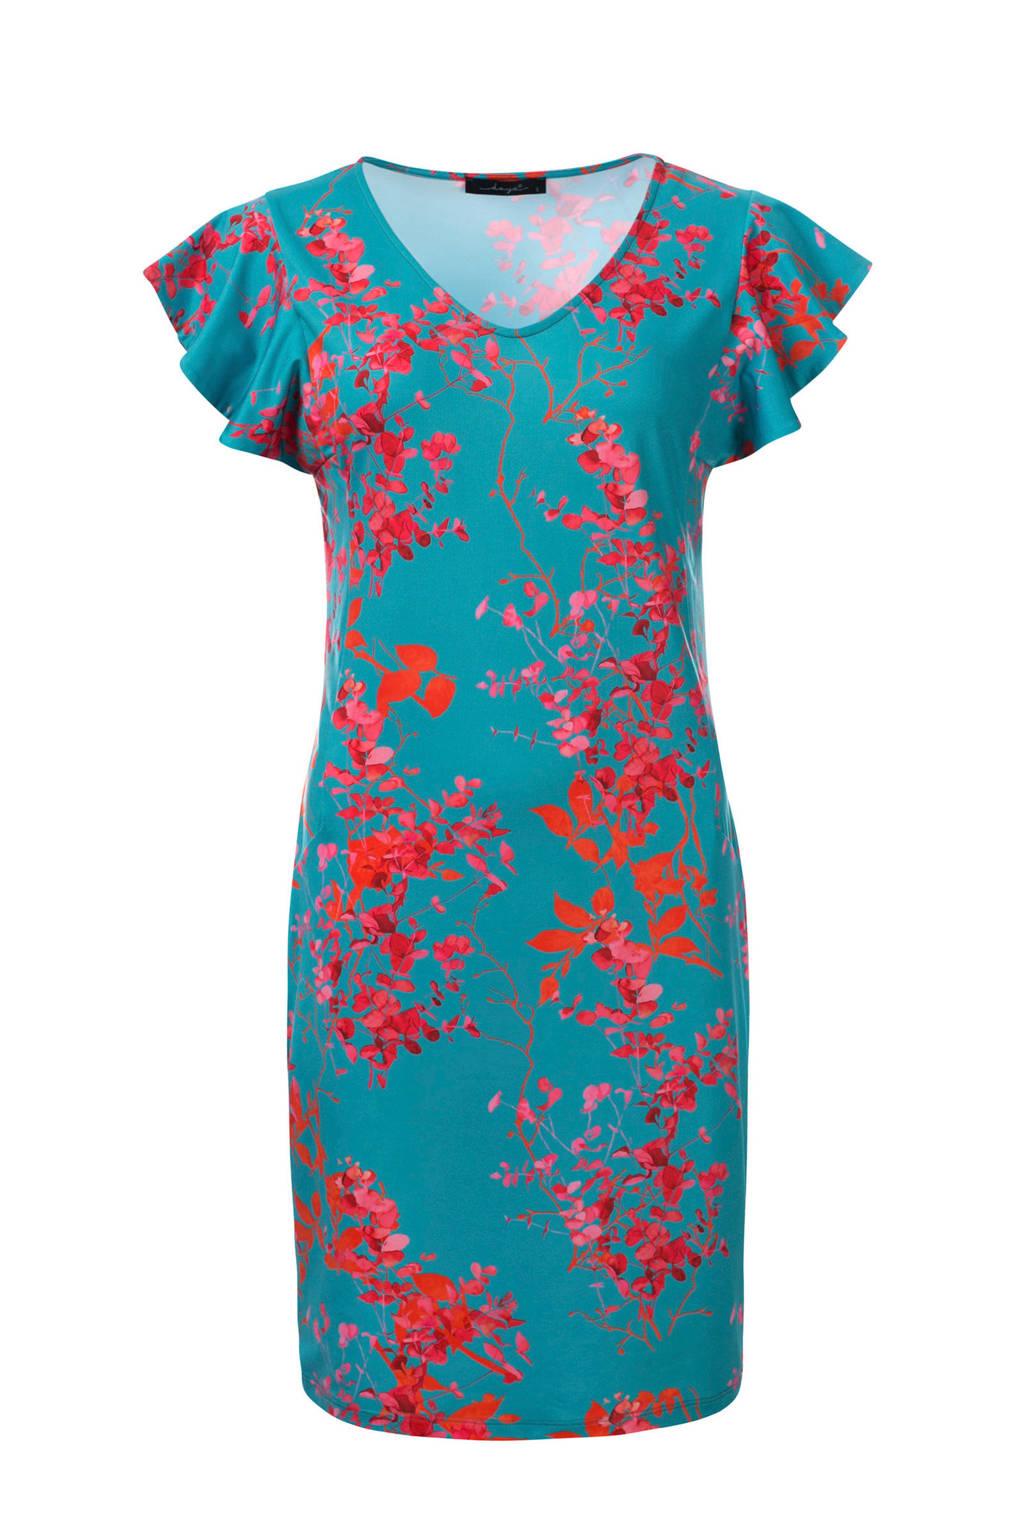 dayz Xevise jurk met volant, Turquoise/roze/rood